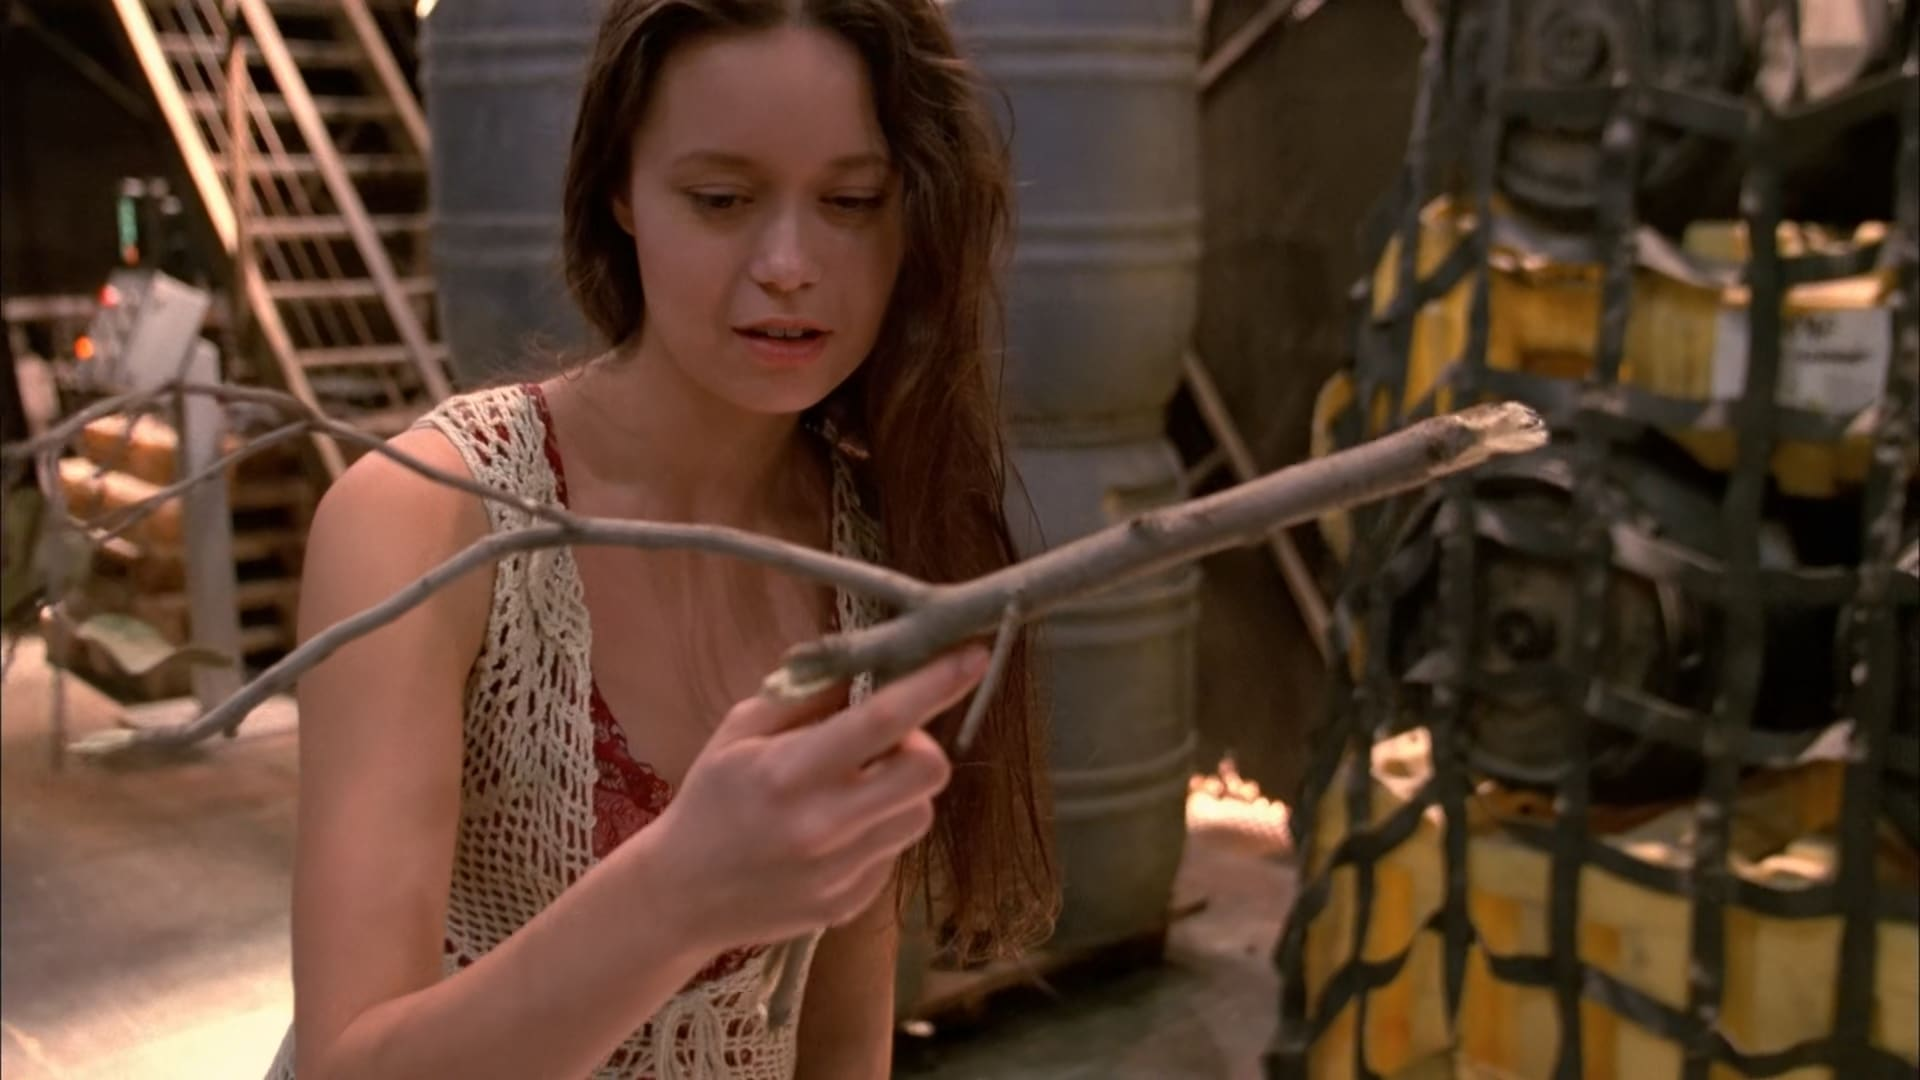 Firefly: Season 1 x Episode 10 - free to watch online - TMovies